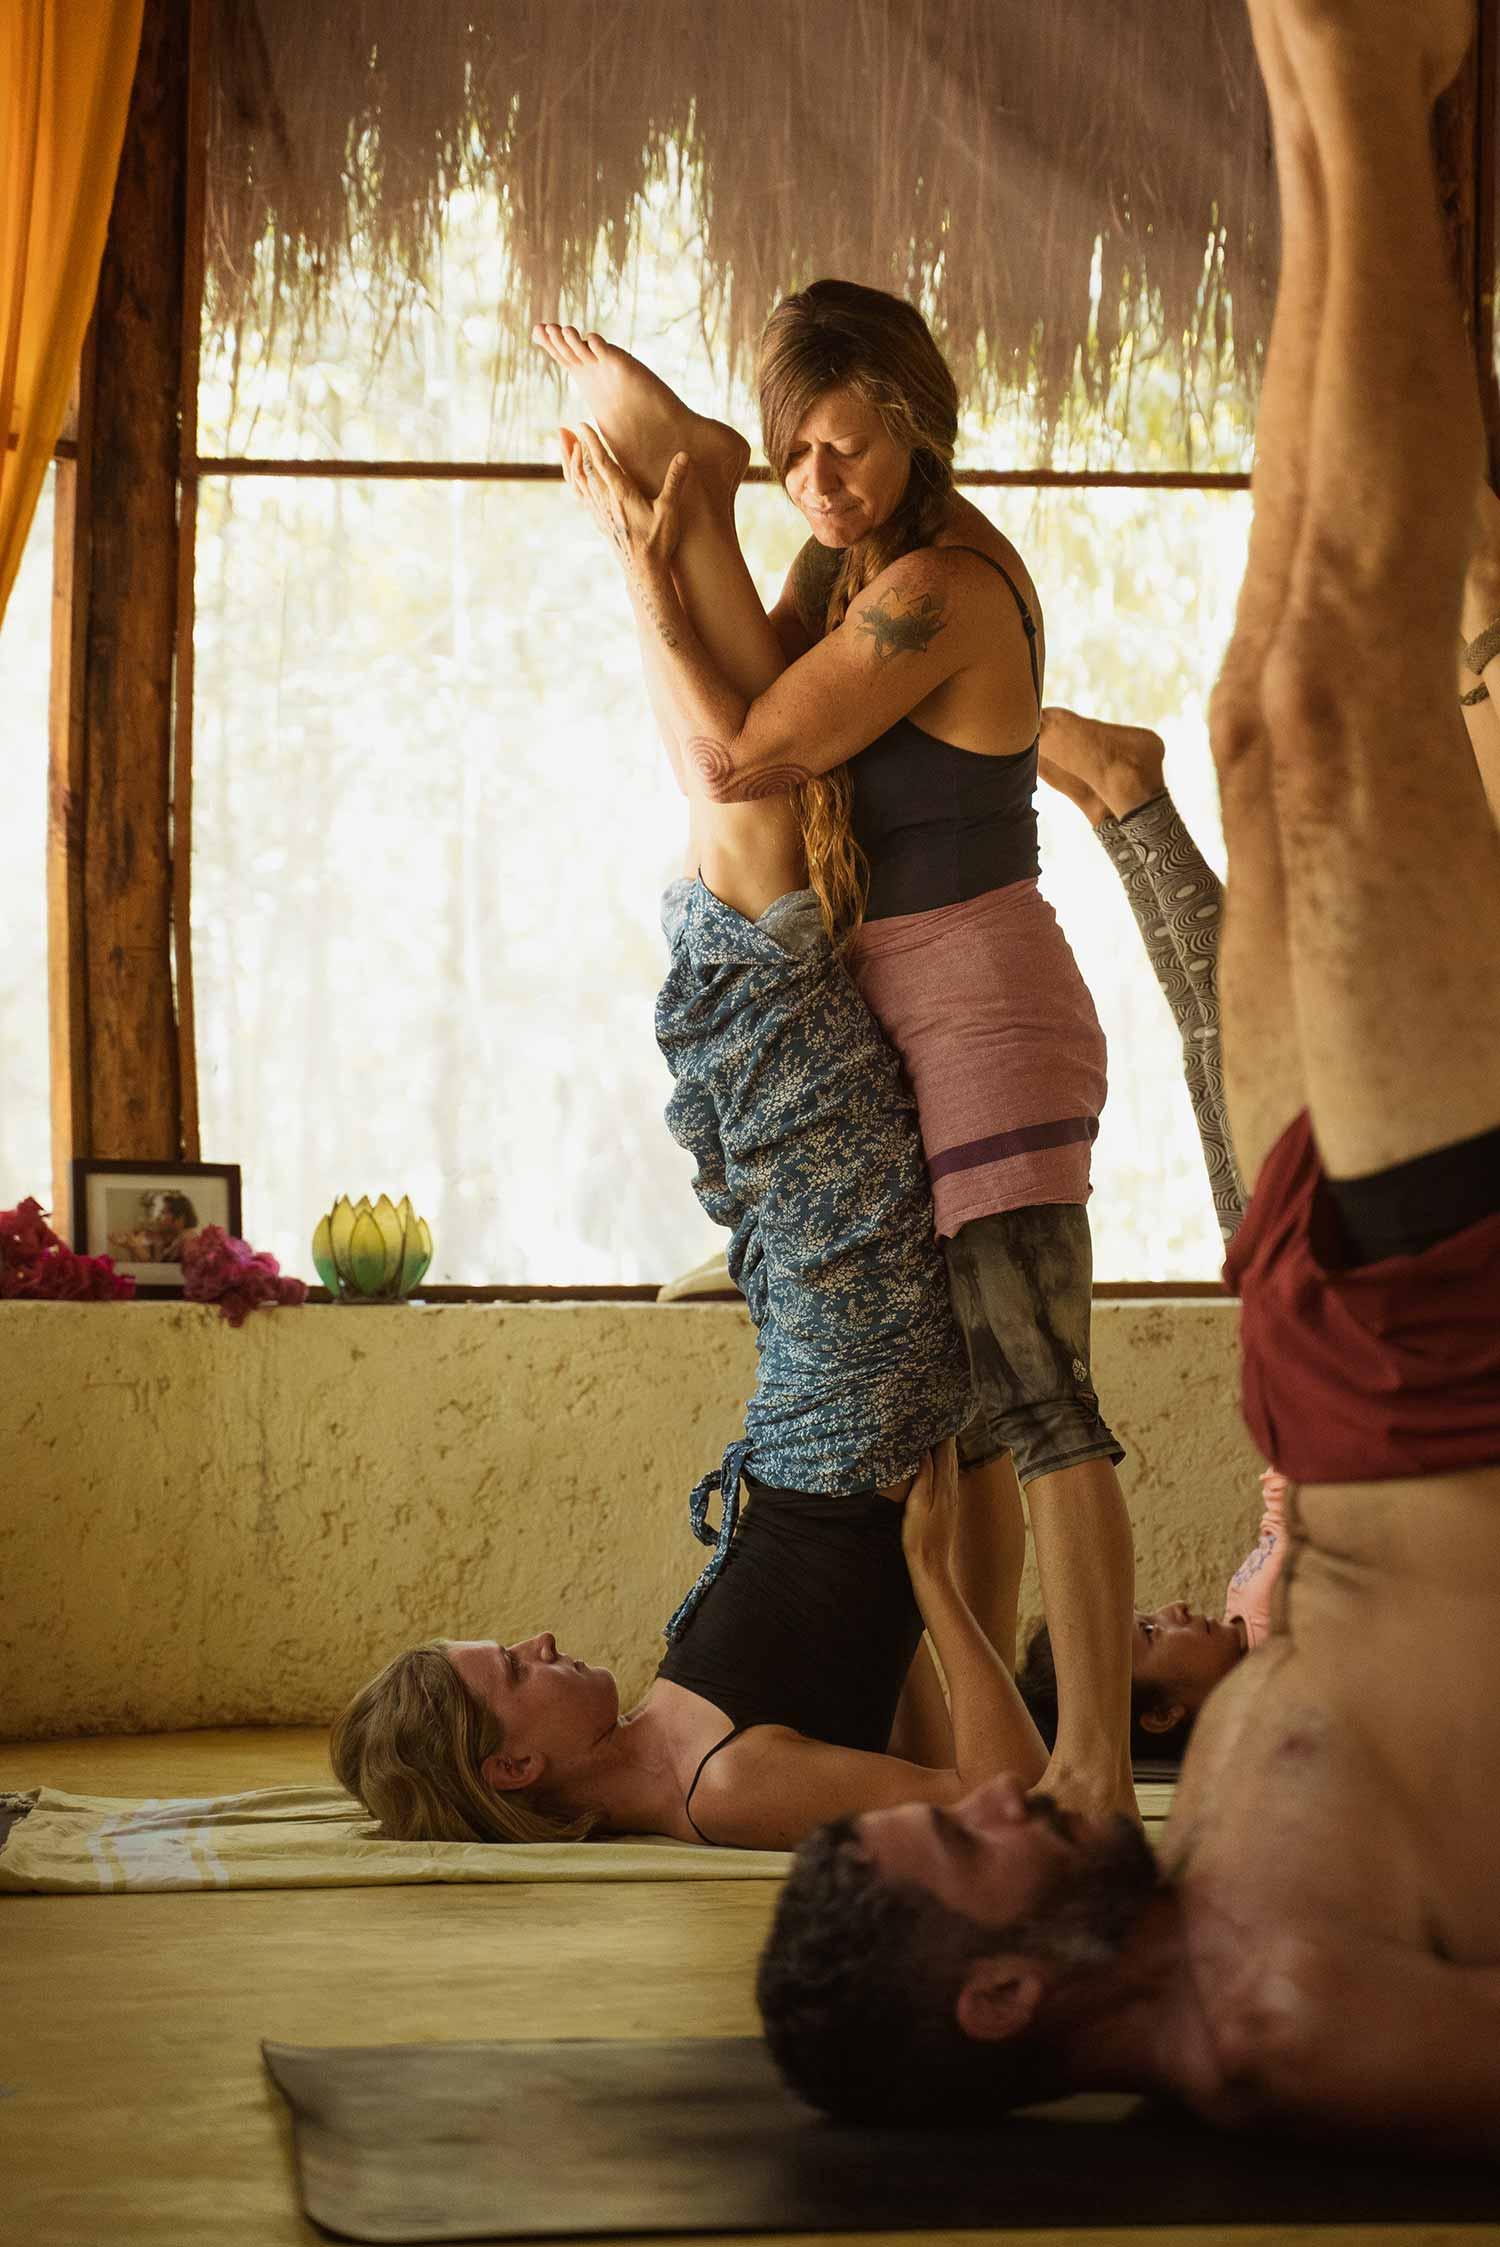 One Breath of Yoga - Community, Consciousness & Self-Realization